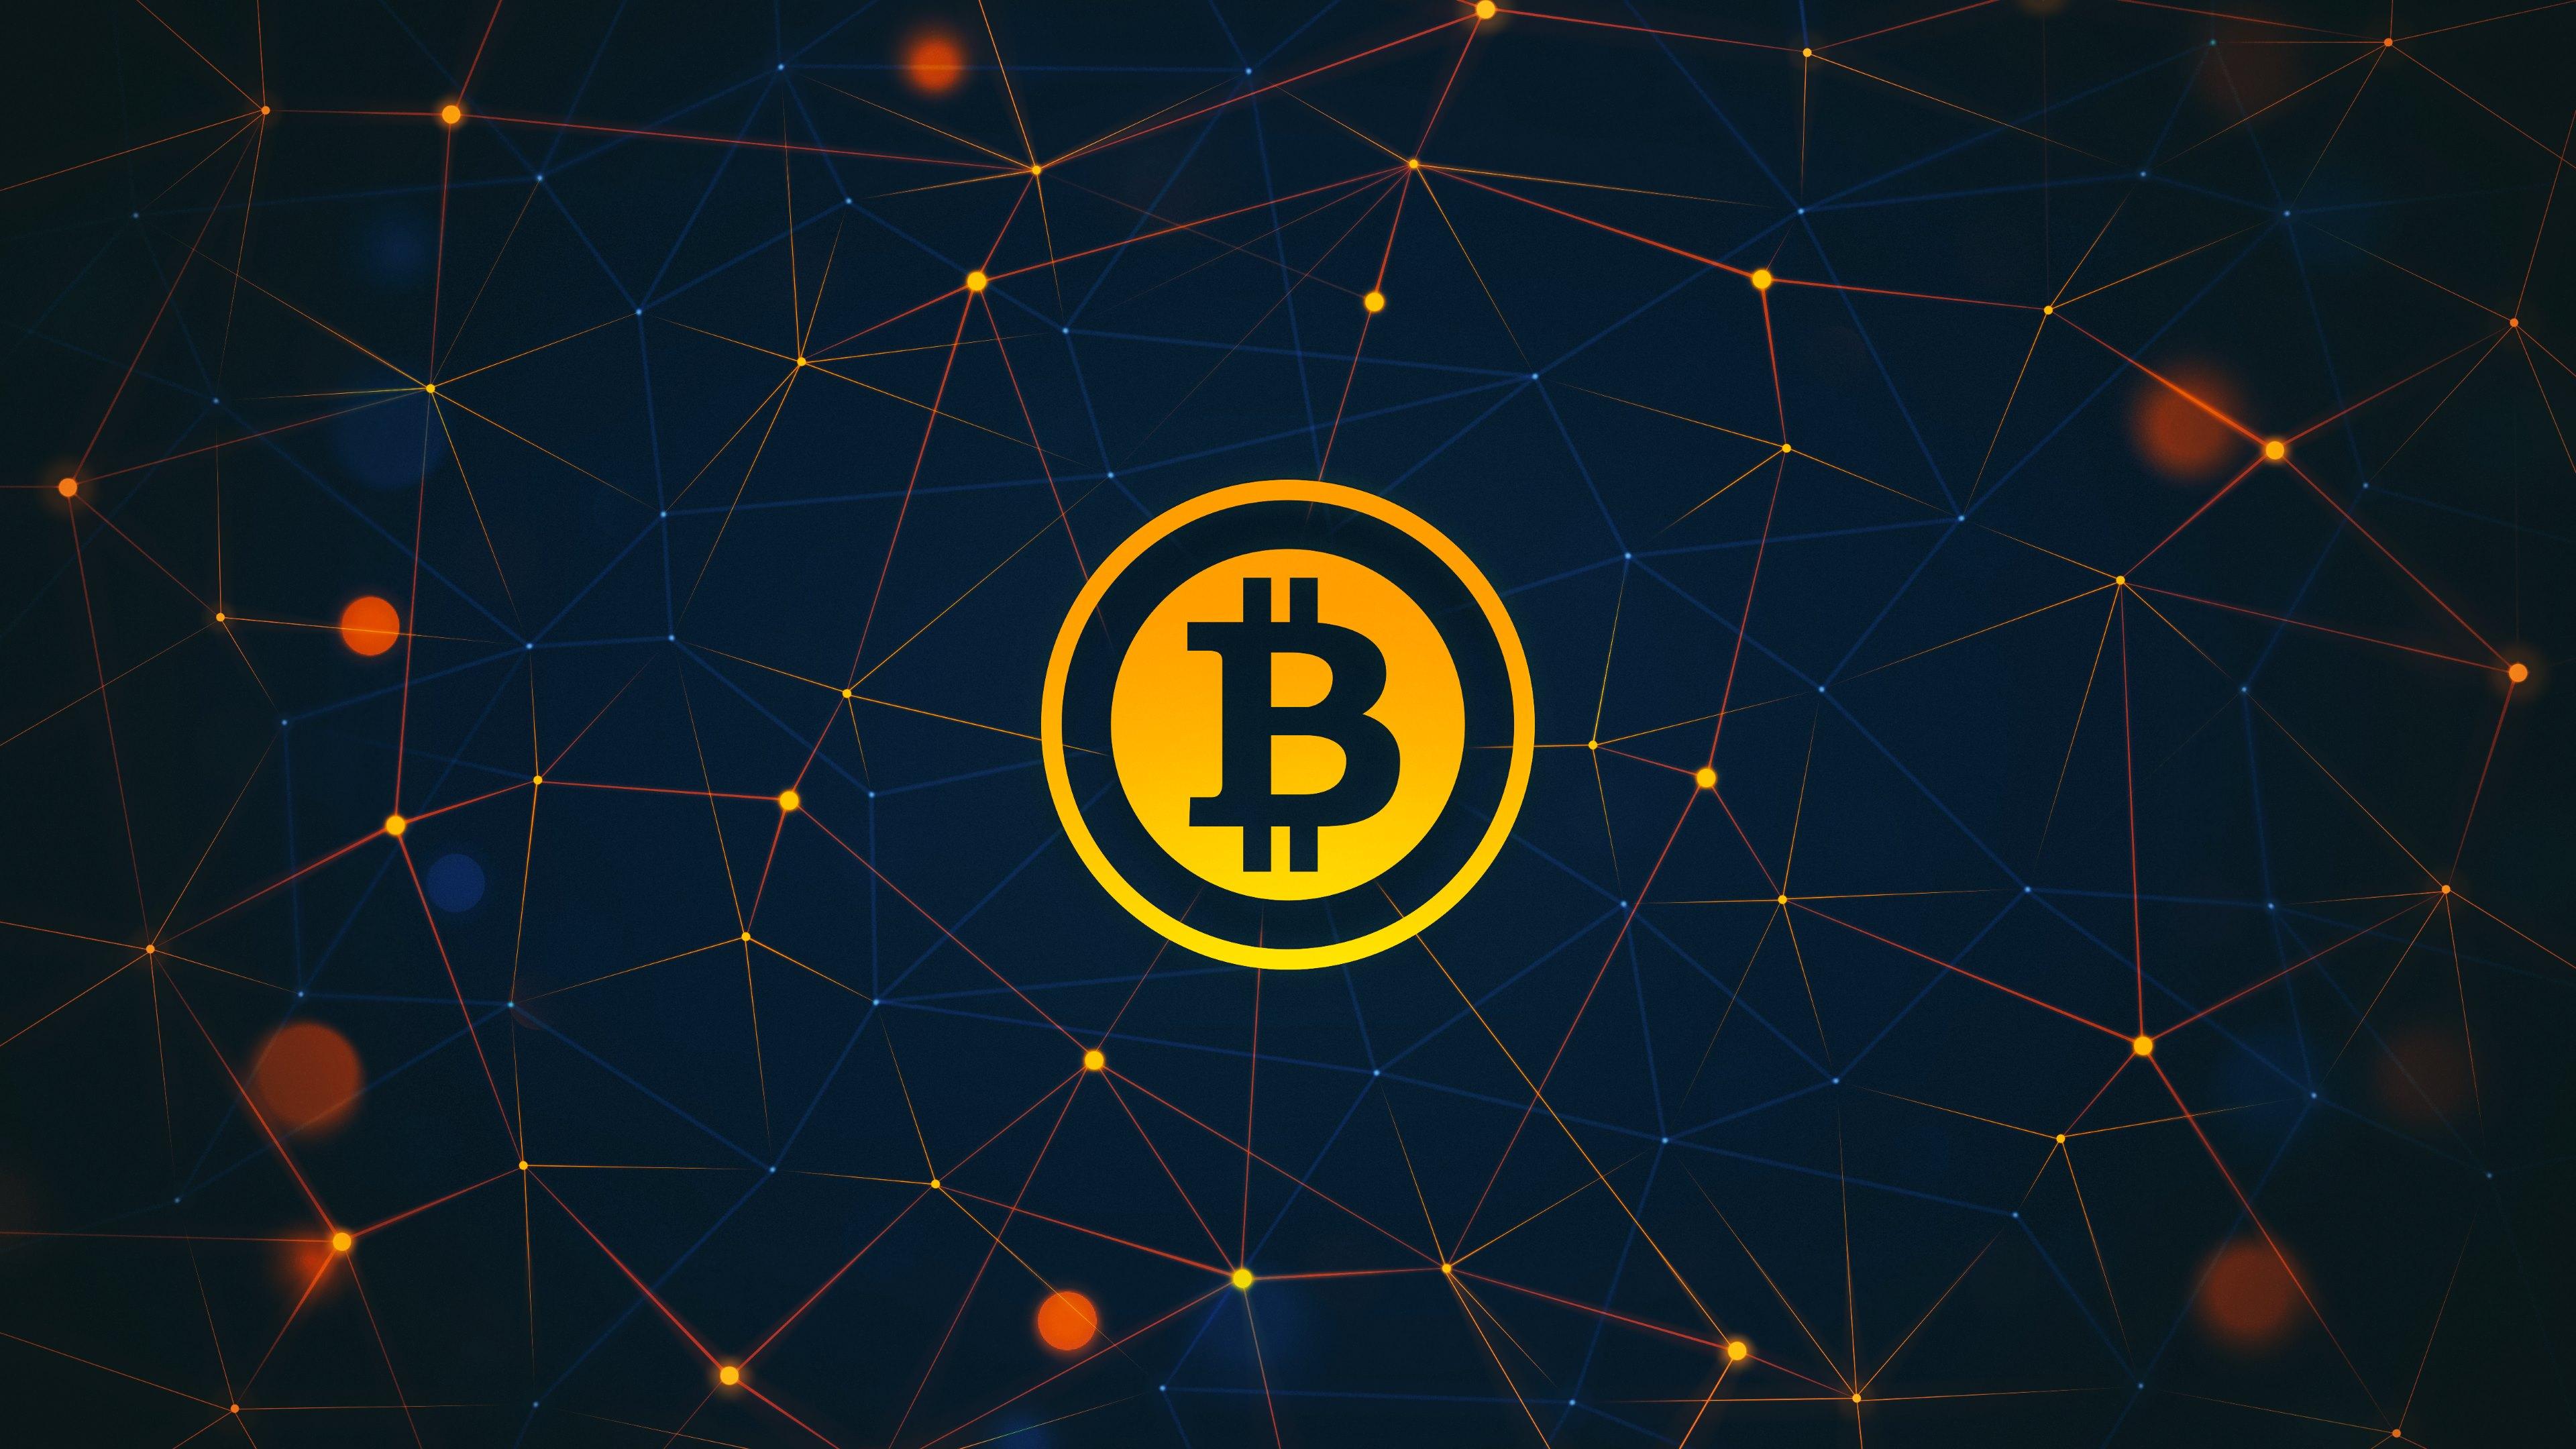 download Abstract Bitcoin Widescreen Wallpaper 62344 3840x2160